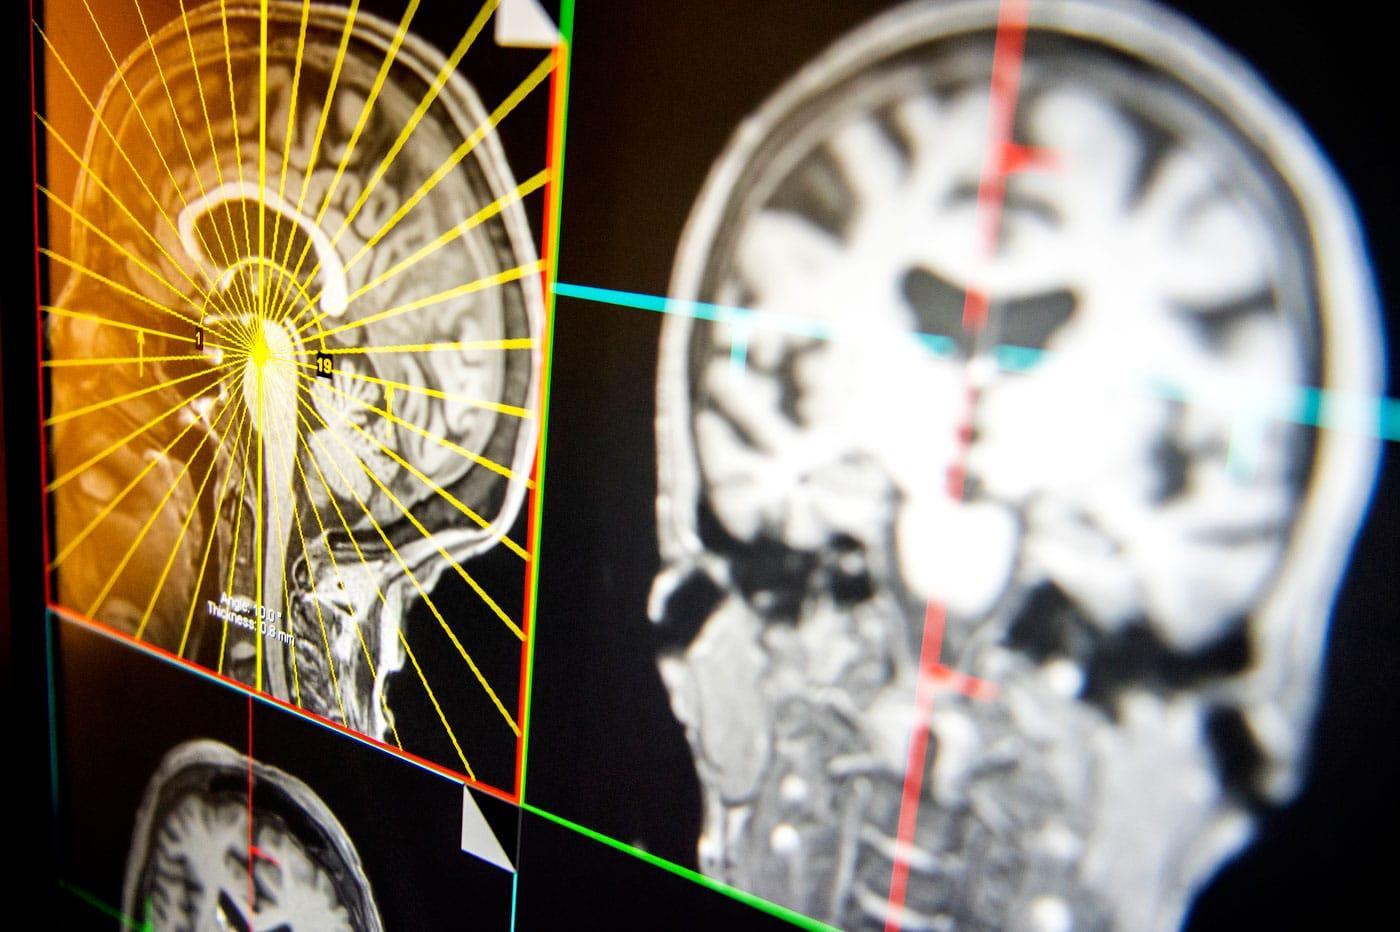 Brain scans can predict children's mental health problems ...